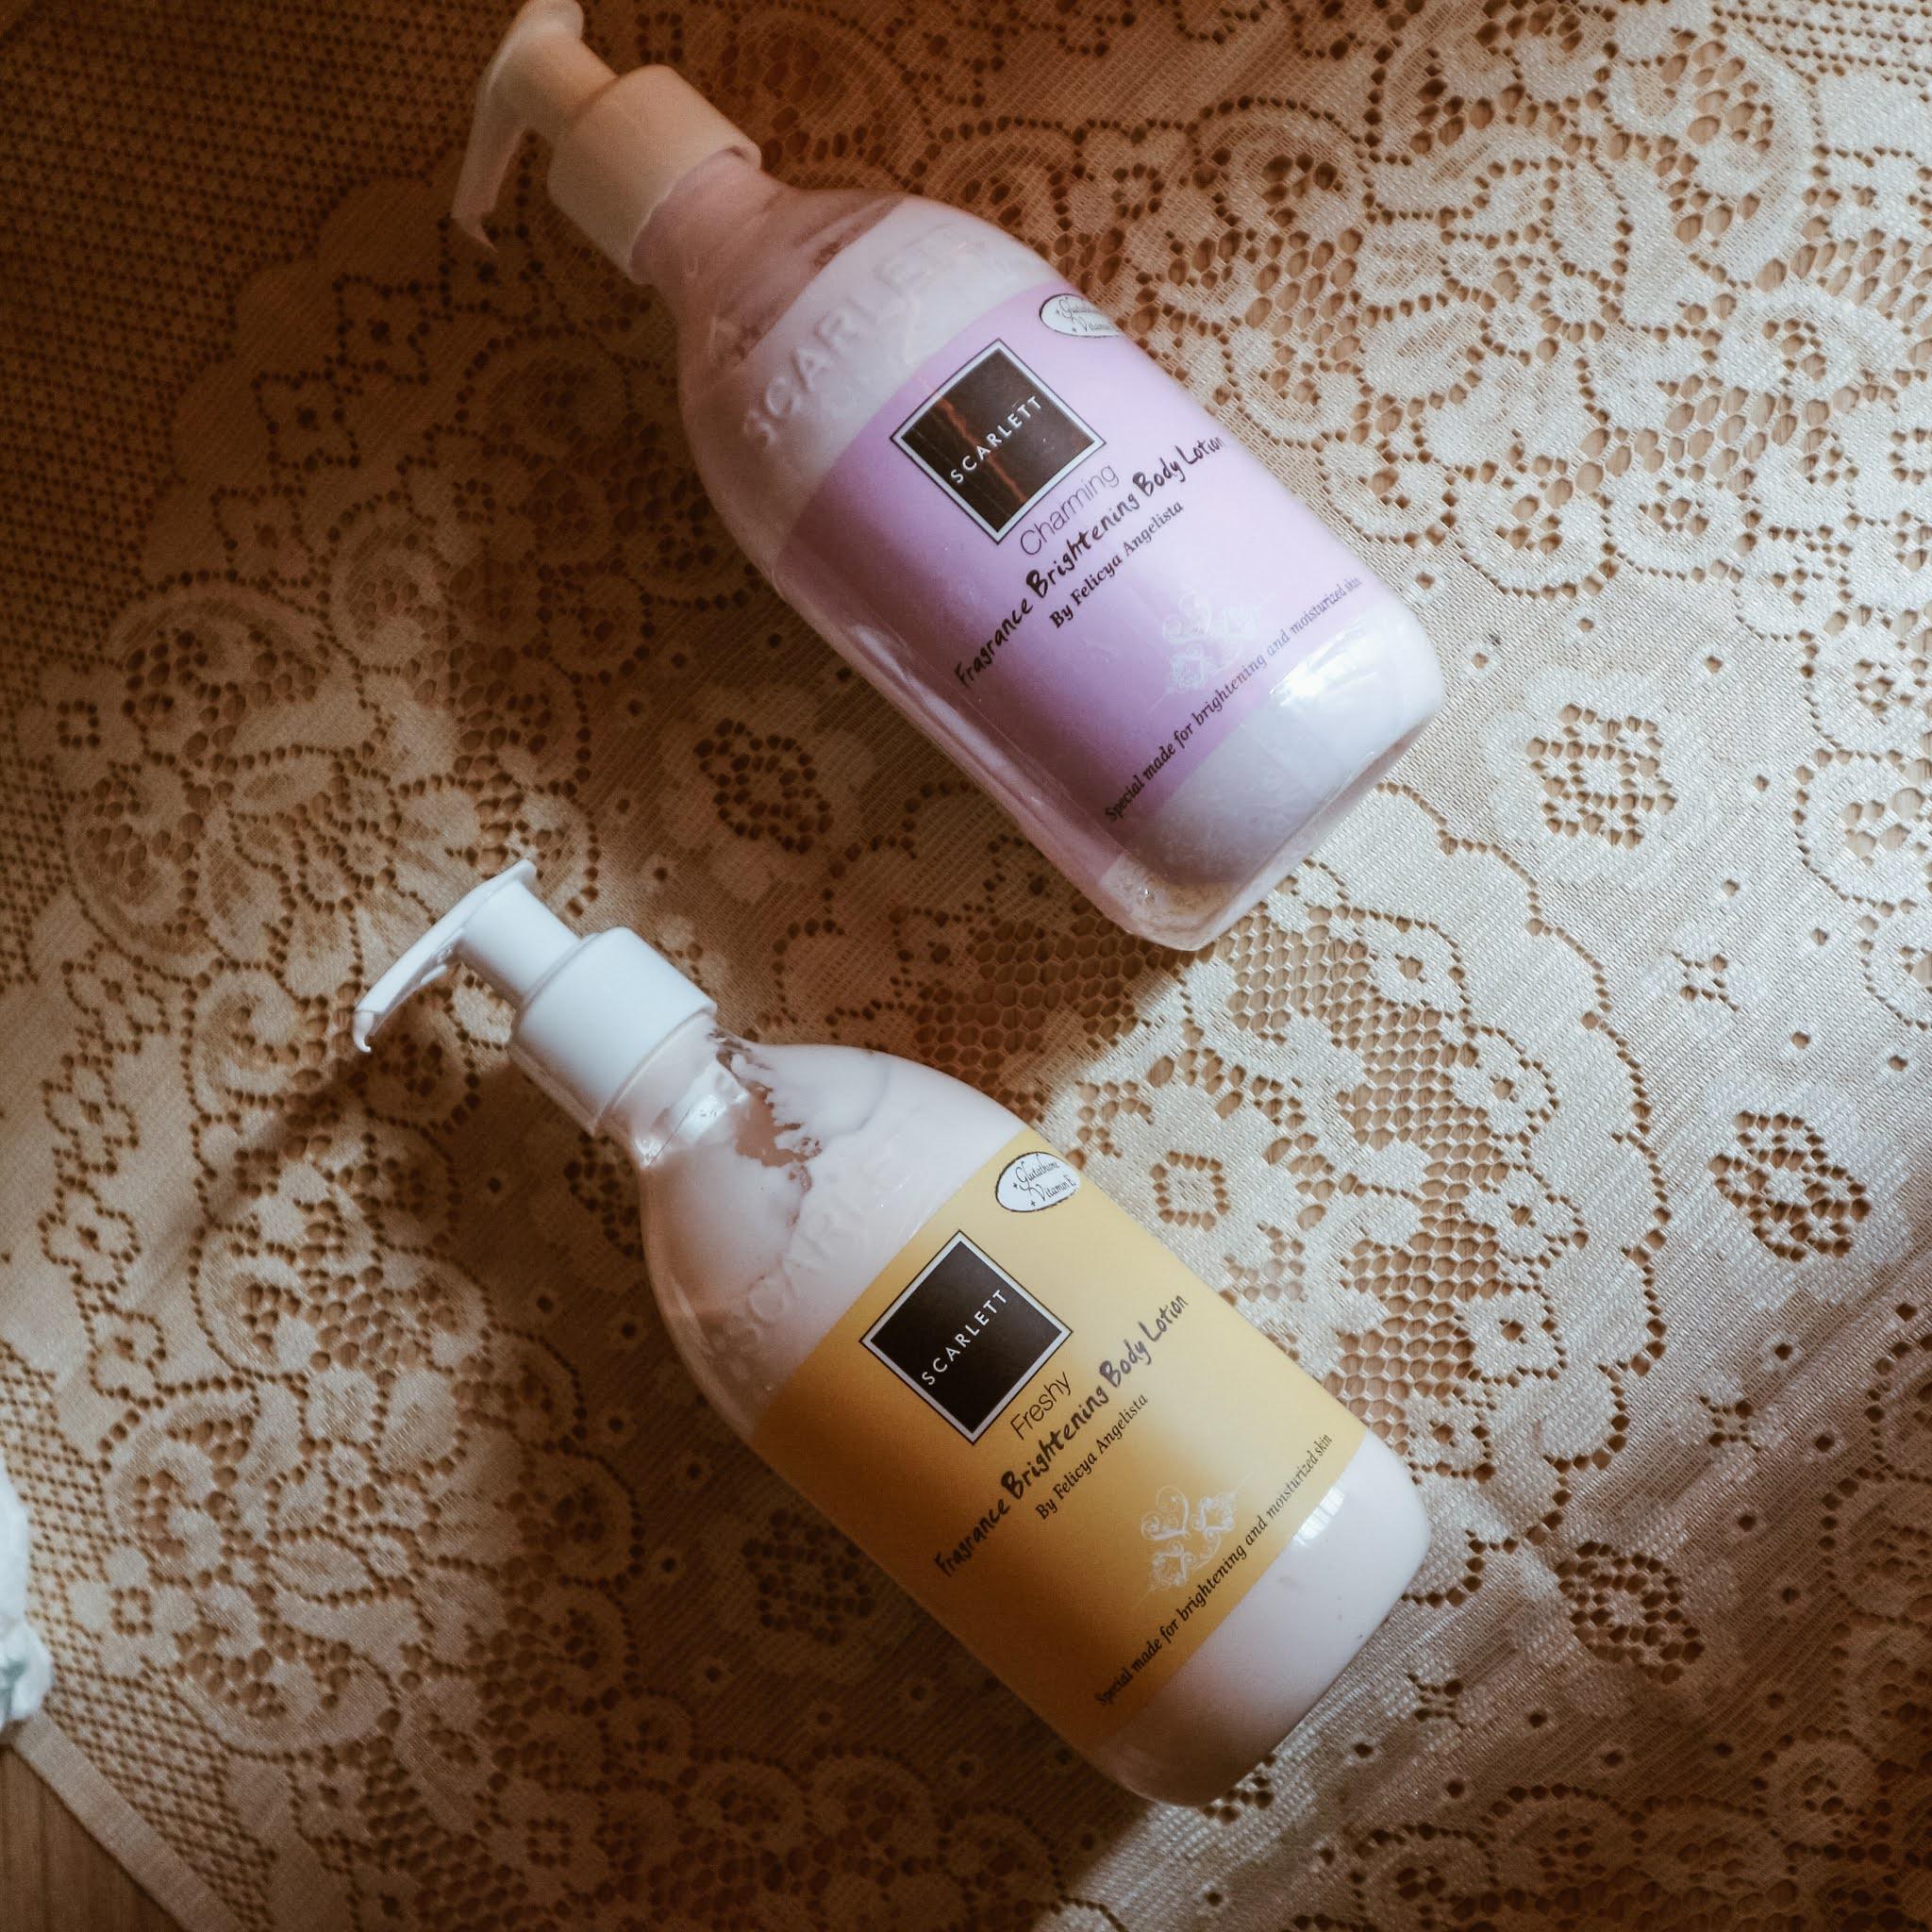 Review Scarlett Fragrance Brightening Body Lotion